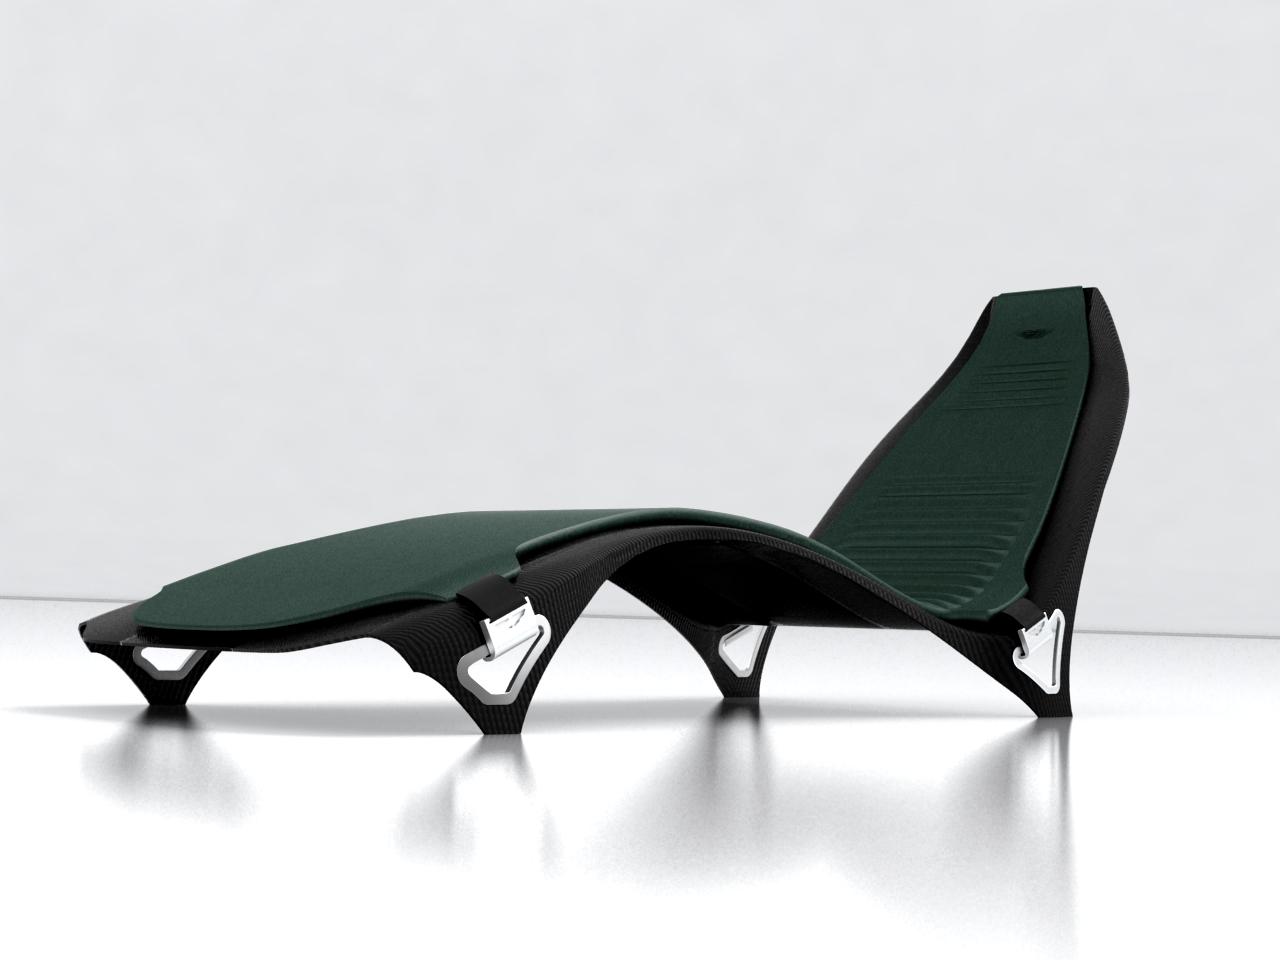 Des Meubles Design Inspir S Par Aston Martin  # Meubles Design